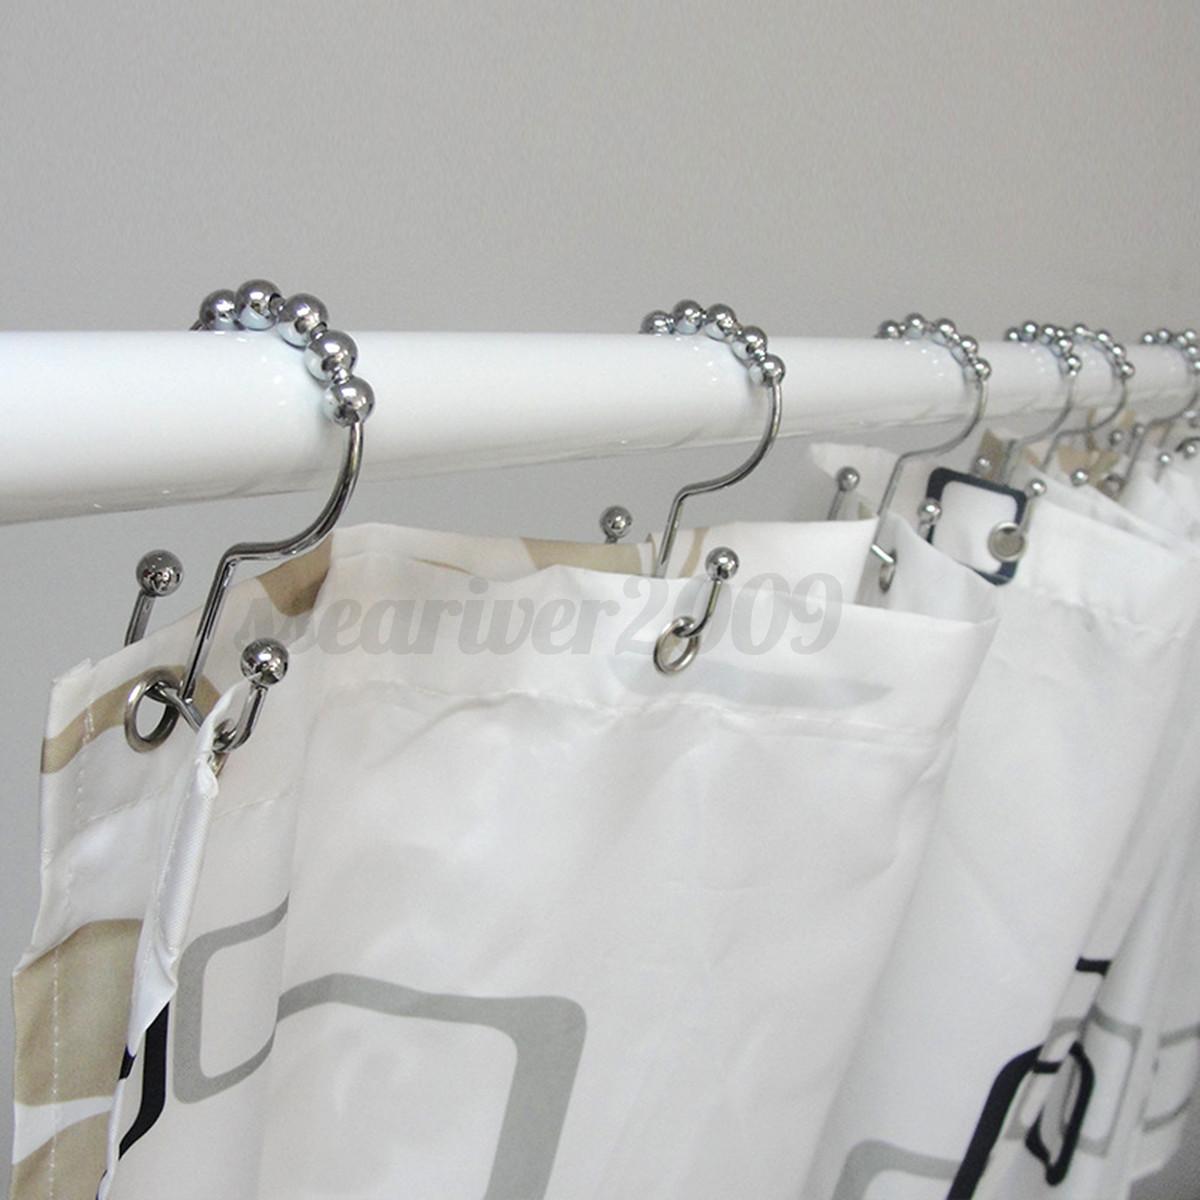 Bathroom Curtain Pole: 12Pcs Metal Double Glide Shower Curtain Rings Hooks